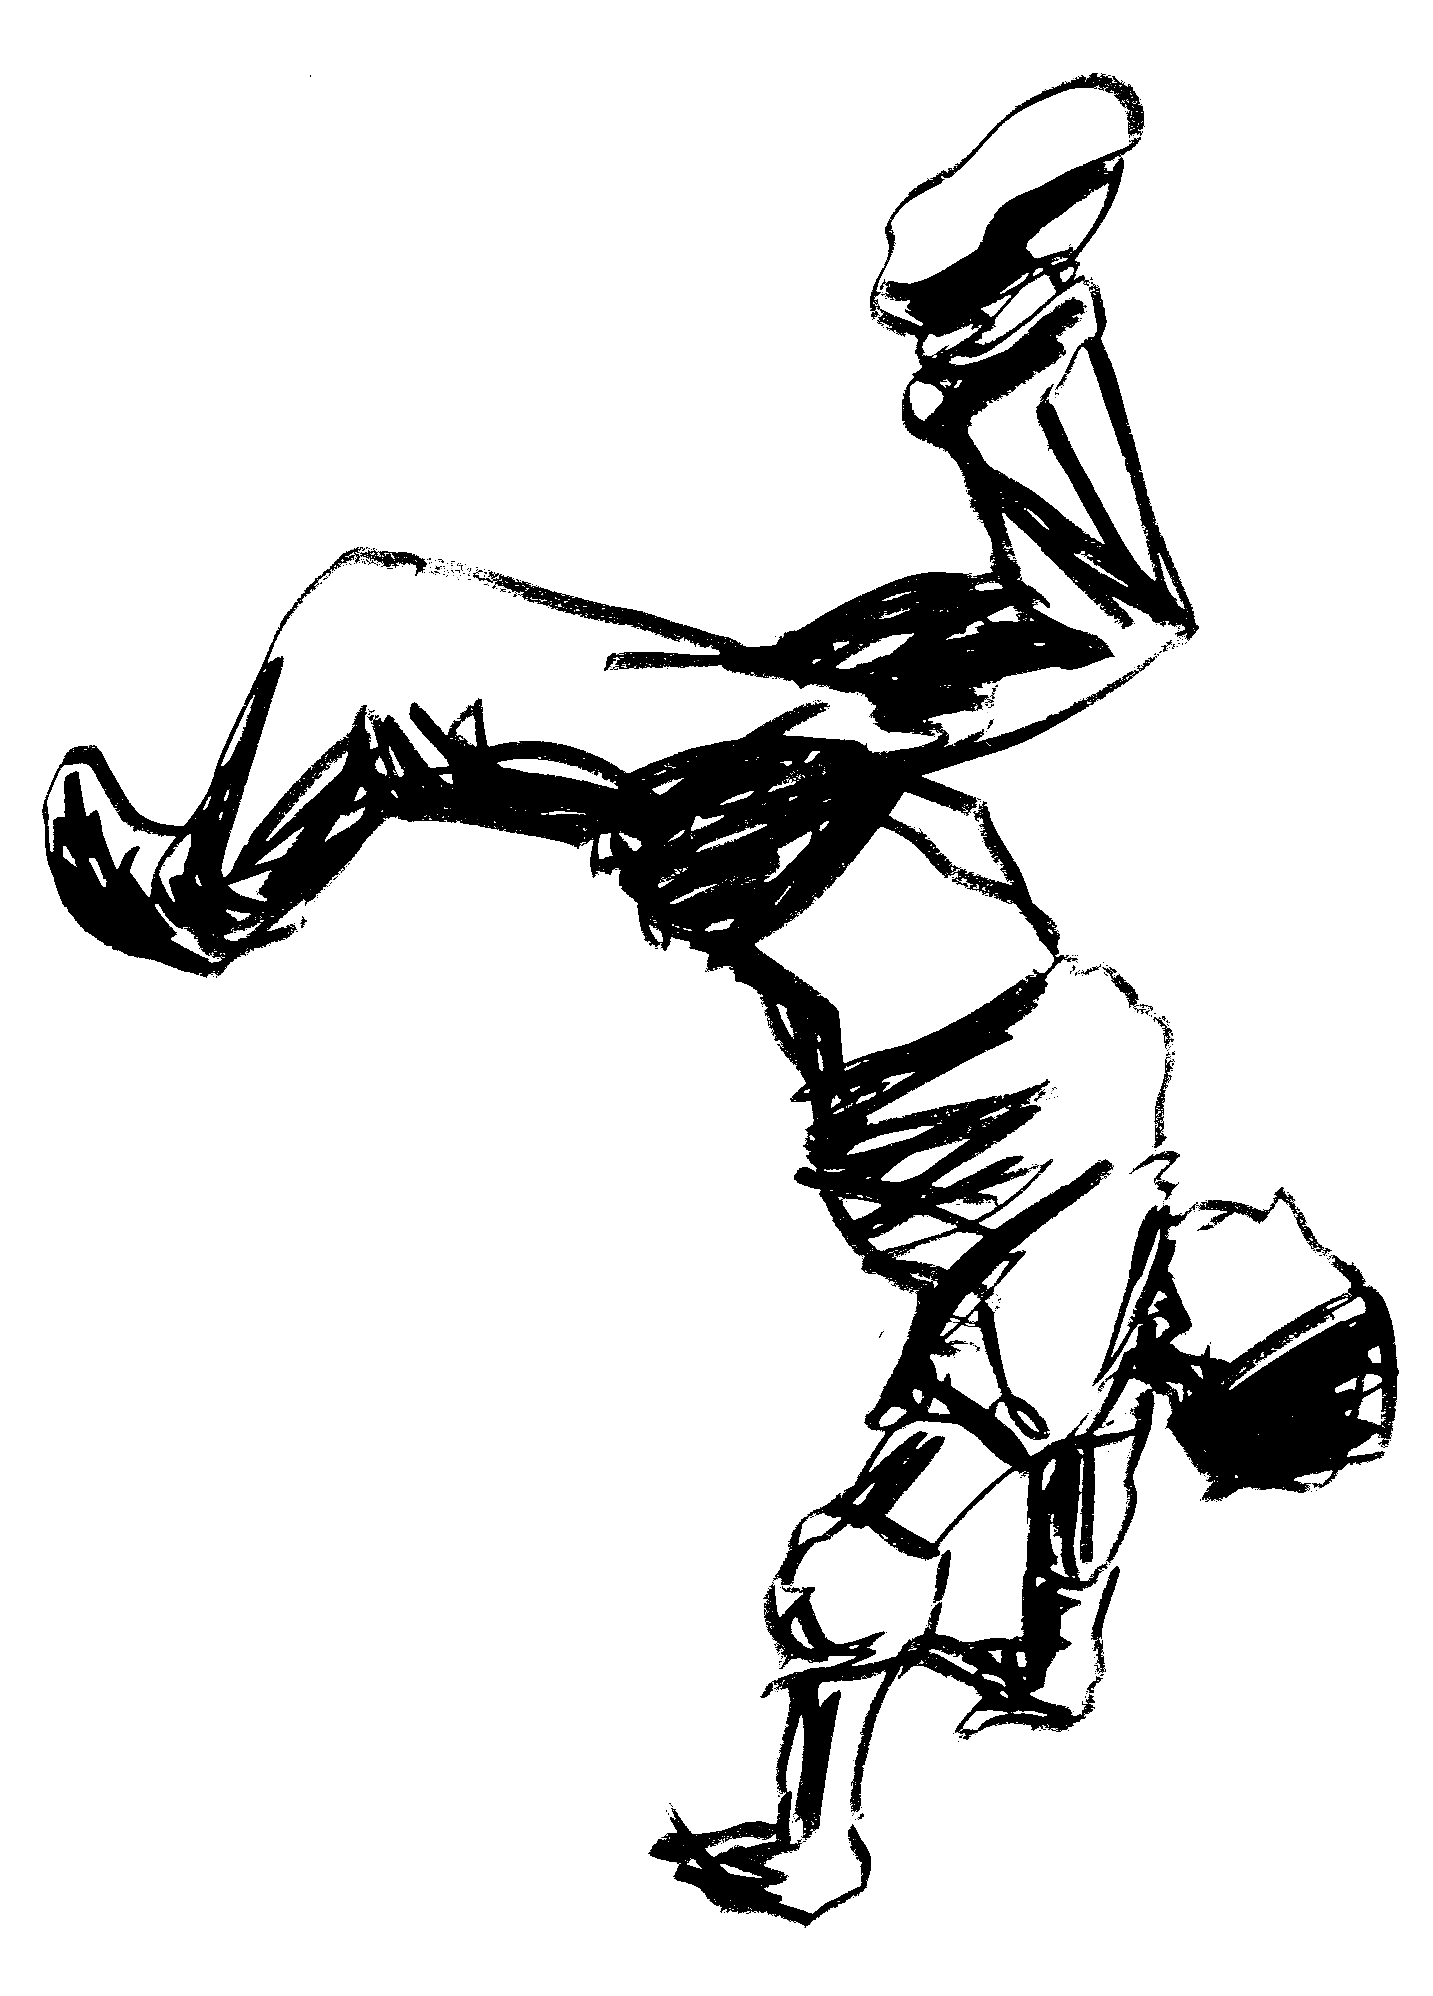 человек танцующий хип-хоп раскраска любом